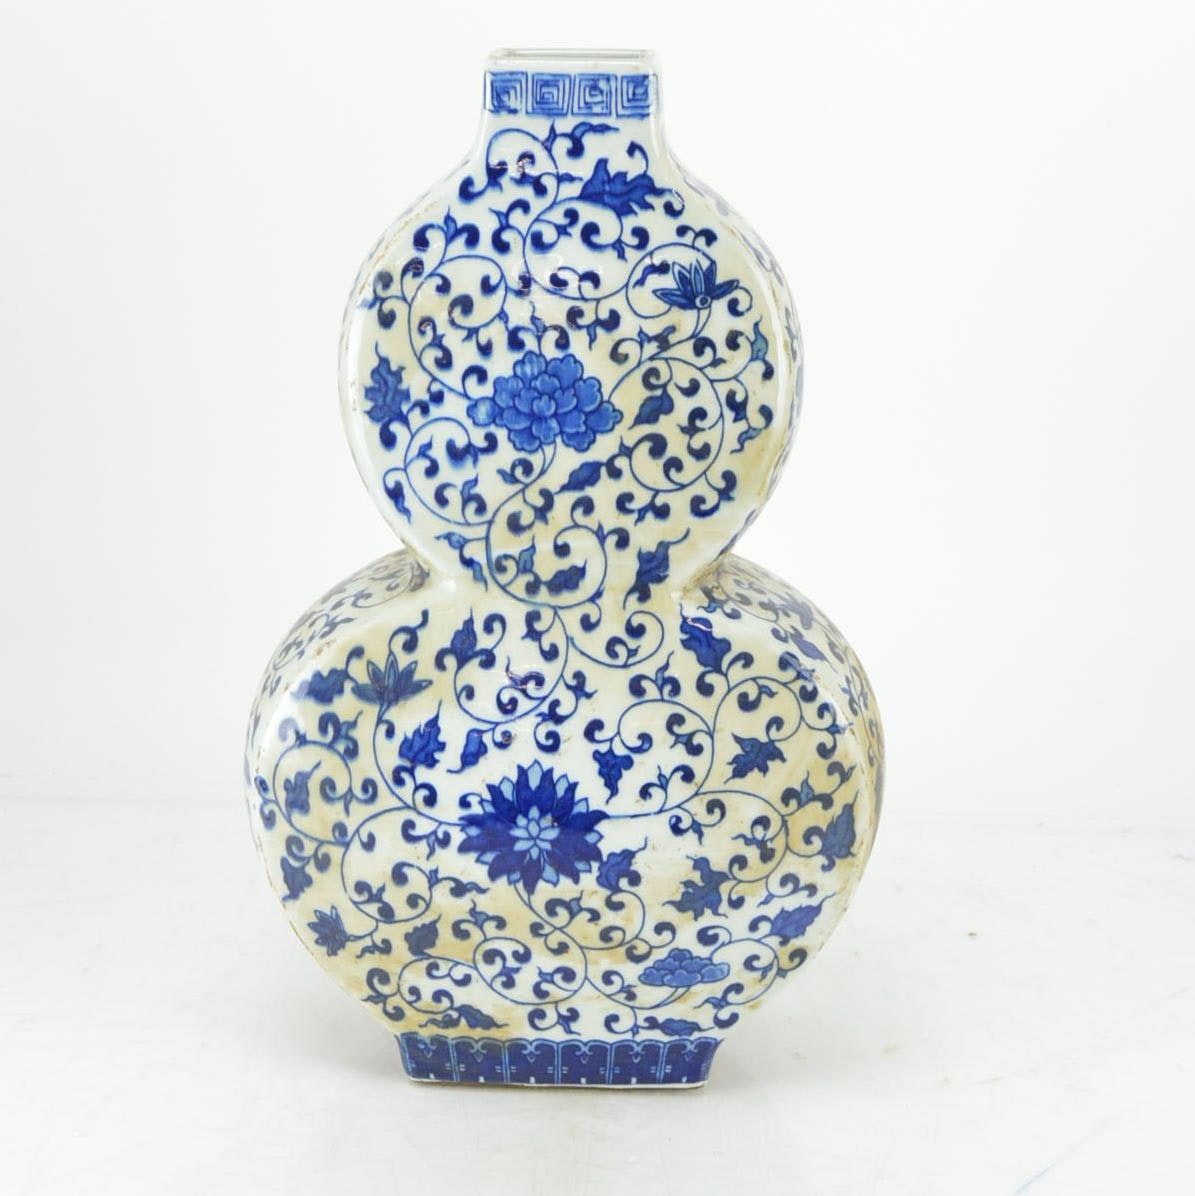 Vintage Blue on White Chinese Double-Gourd Shaped Vase